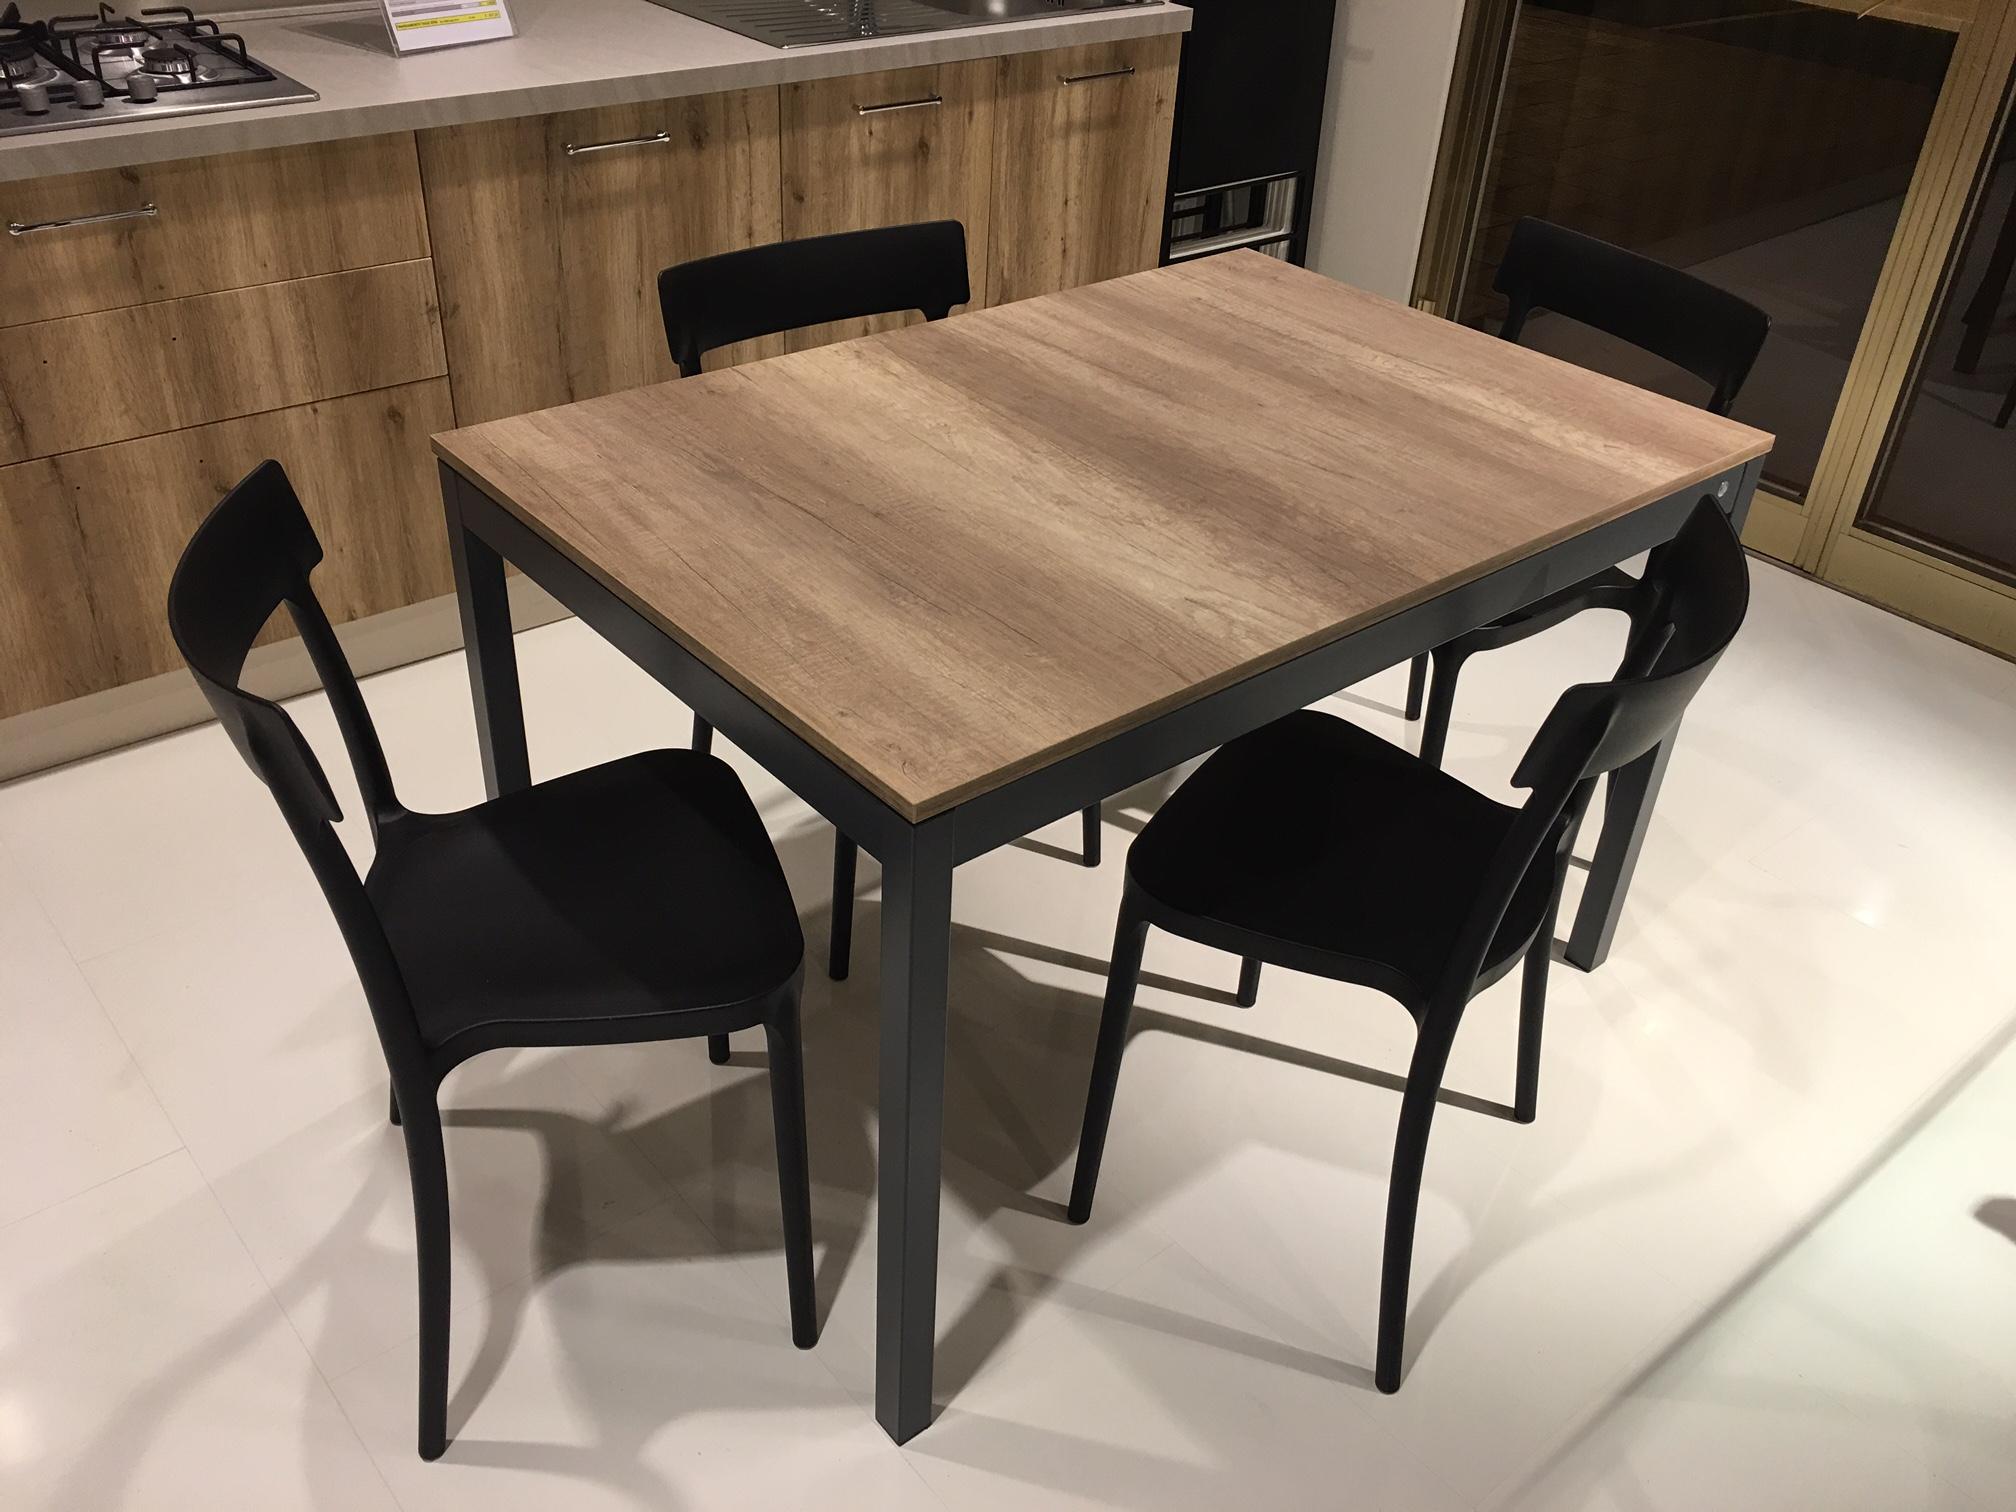 Tavolo da cucina snap lombardelli arredamenti - Tavoli bianchi da cucina ...